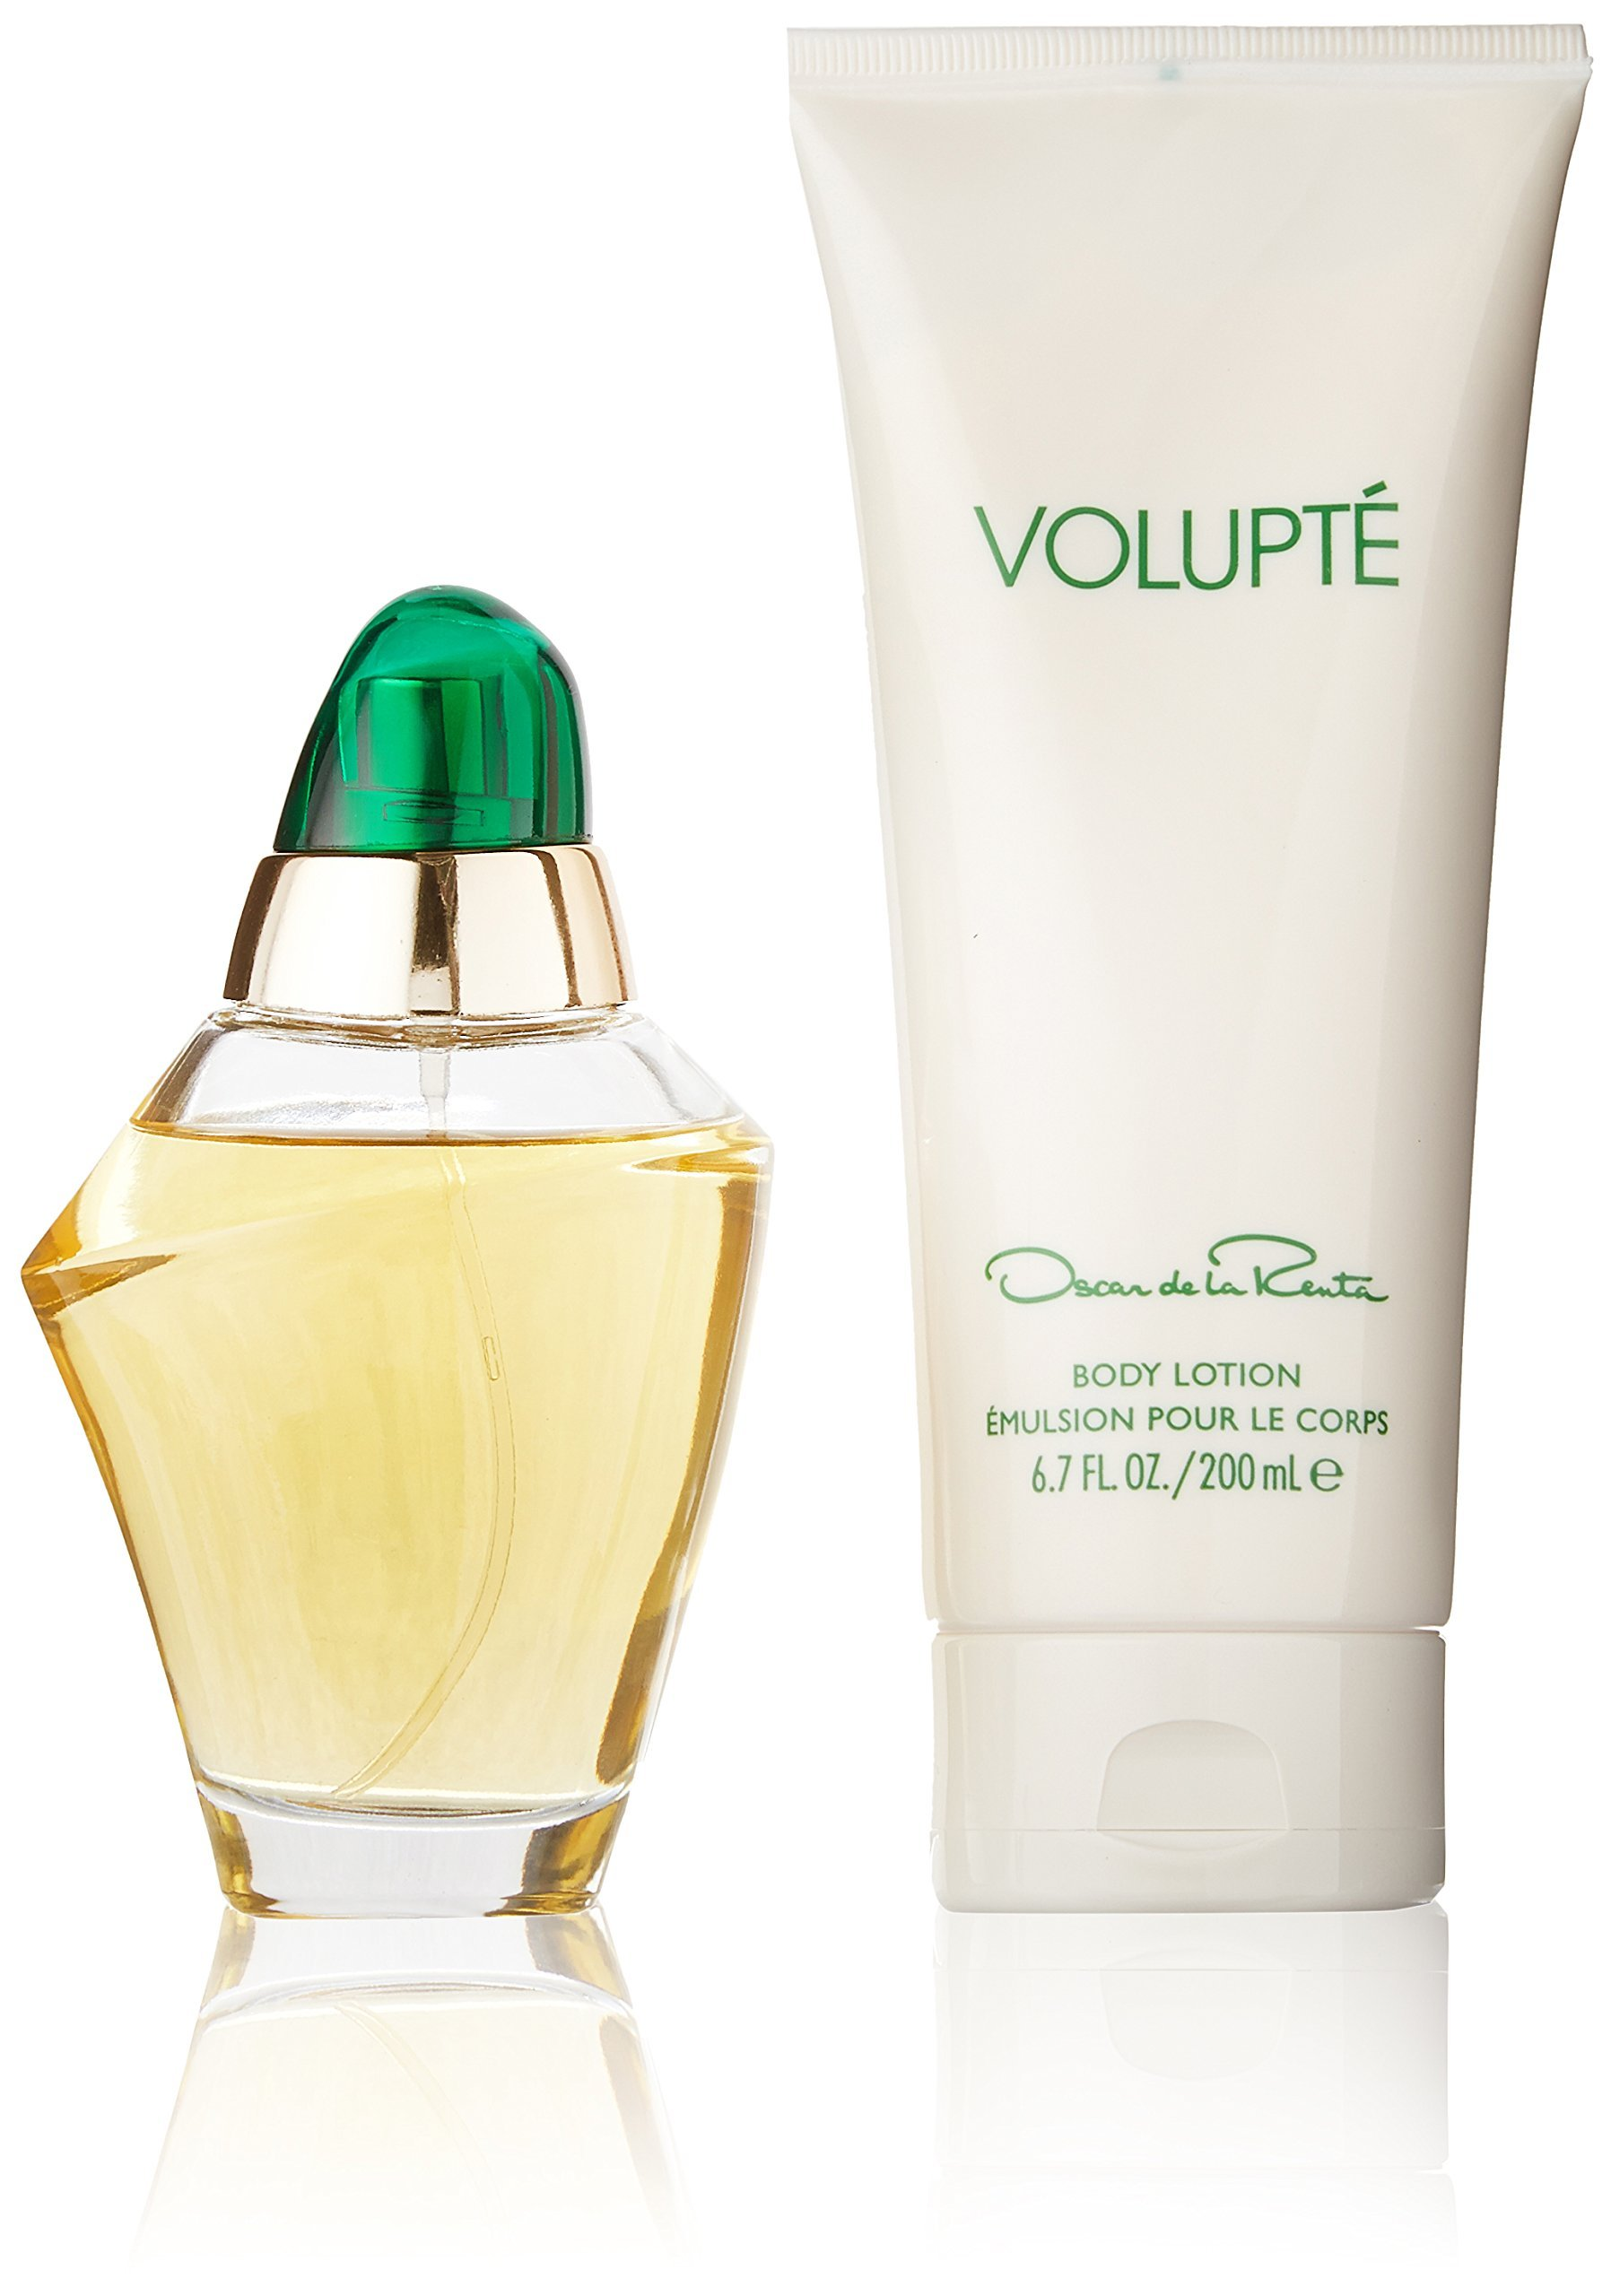 Oscar De La Renta Volupte Fragrance Collection, Women 2 Pc. Gift Set (Eau De Toilette Spray 3.4 Oz + Body Lotion 6.7 Oz) by OSCAR DE LA RENTA